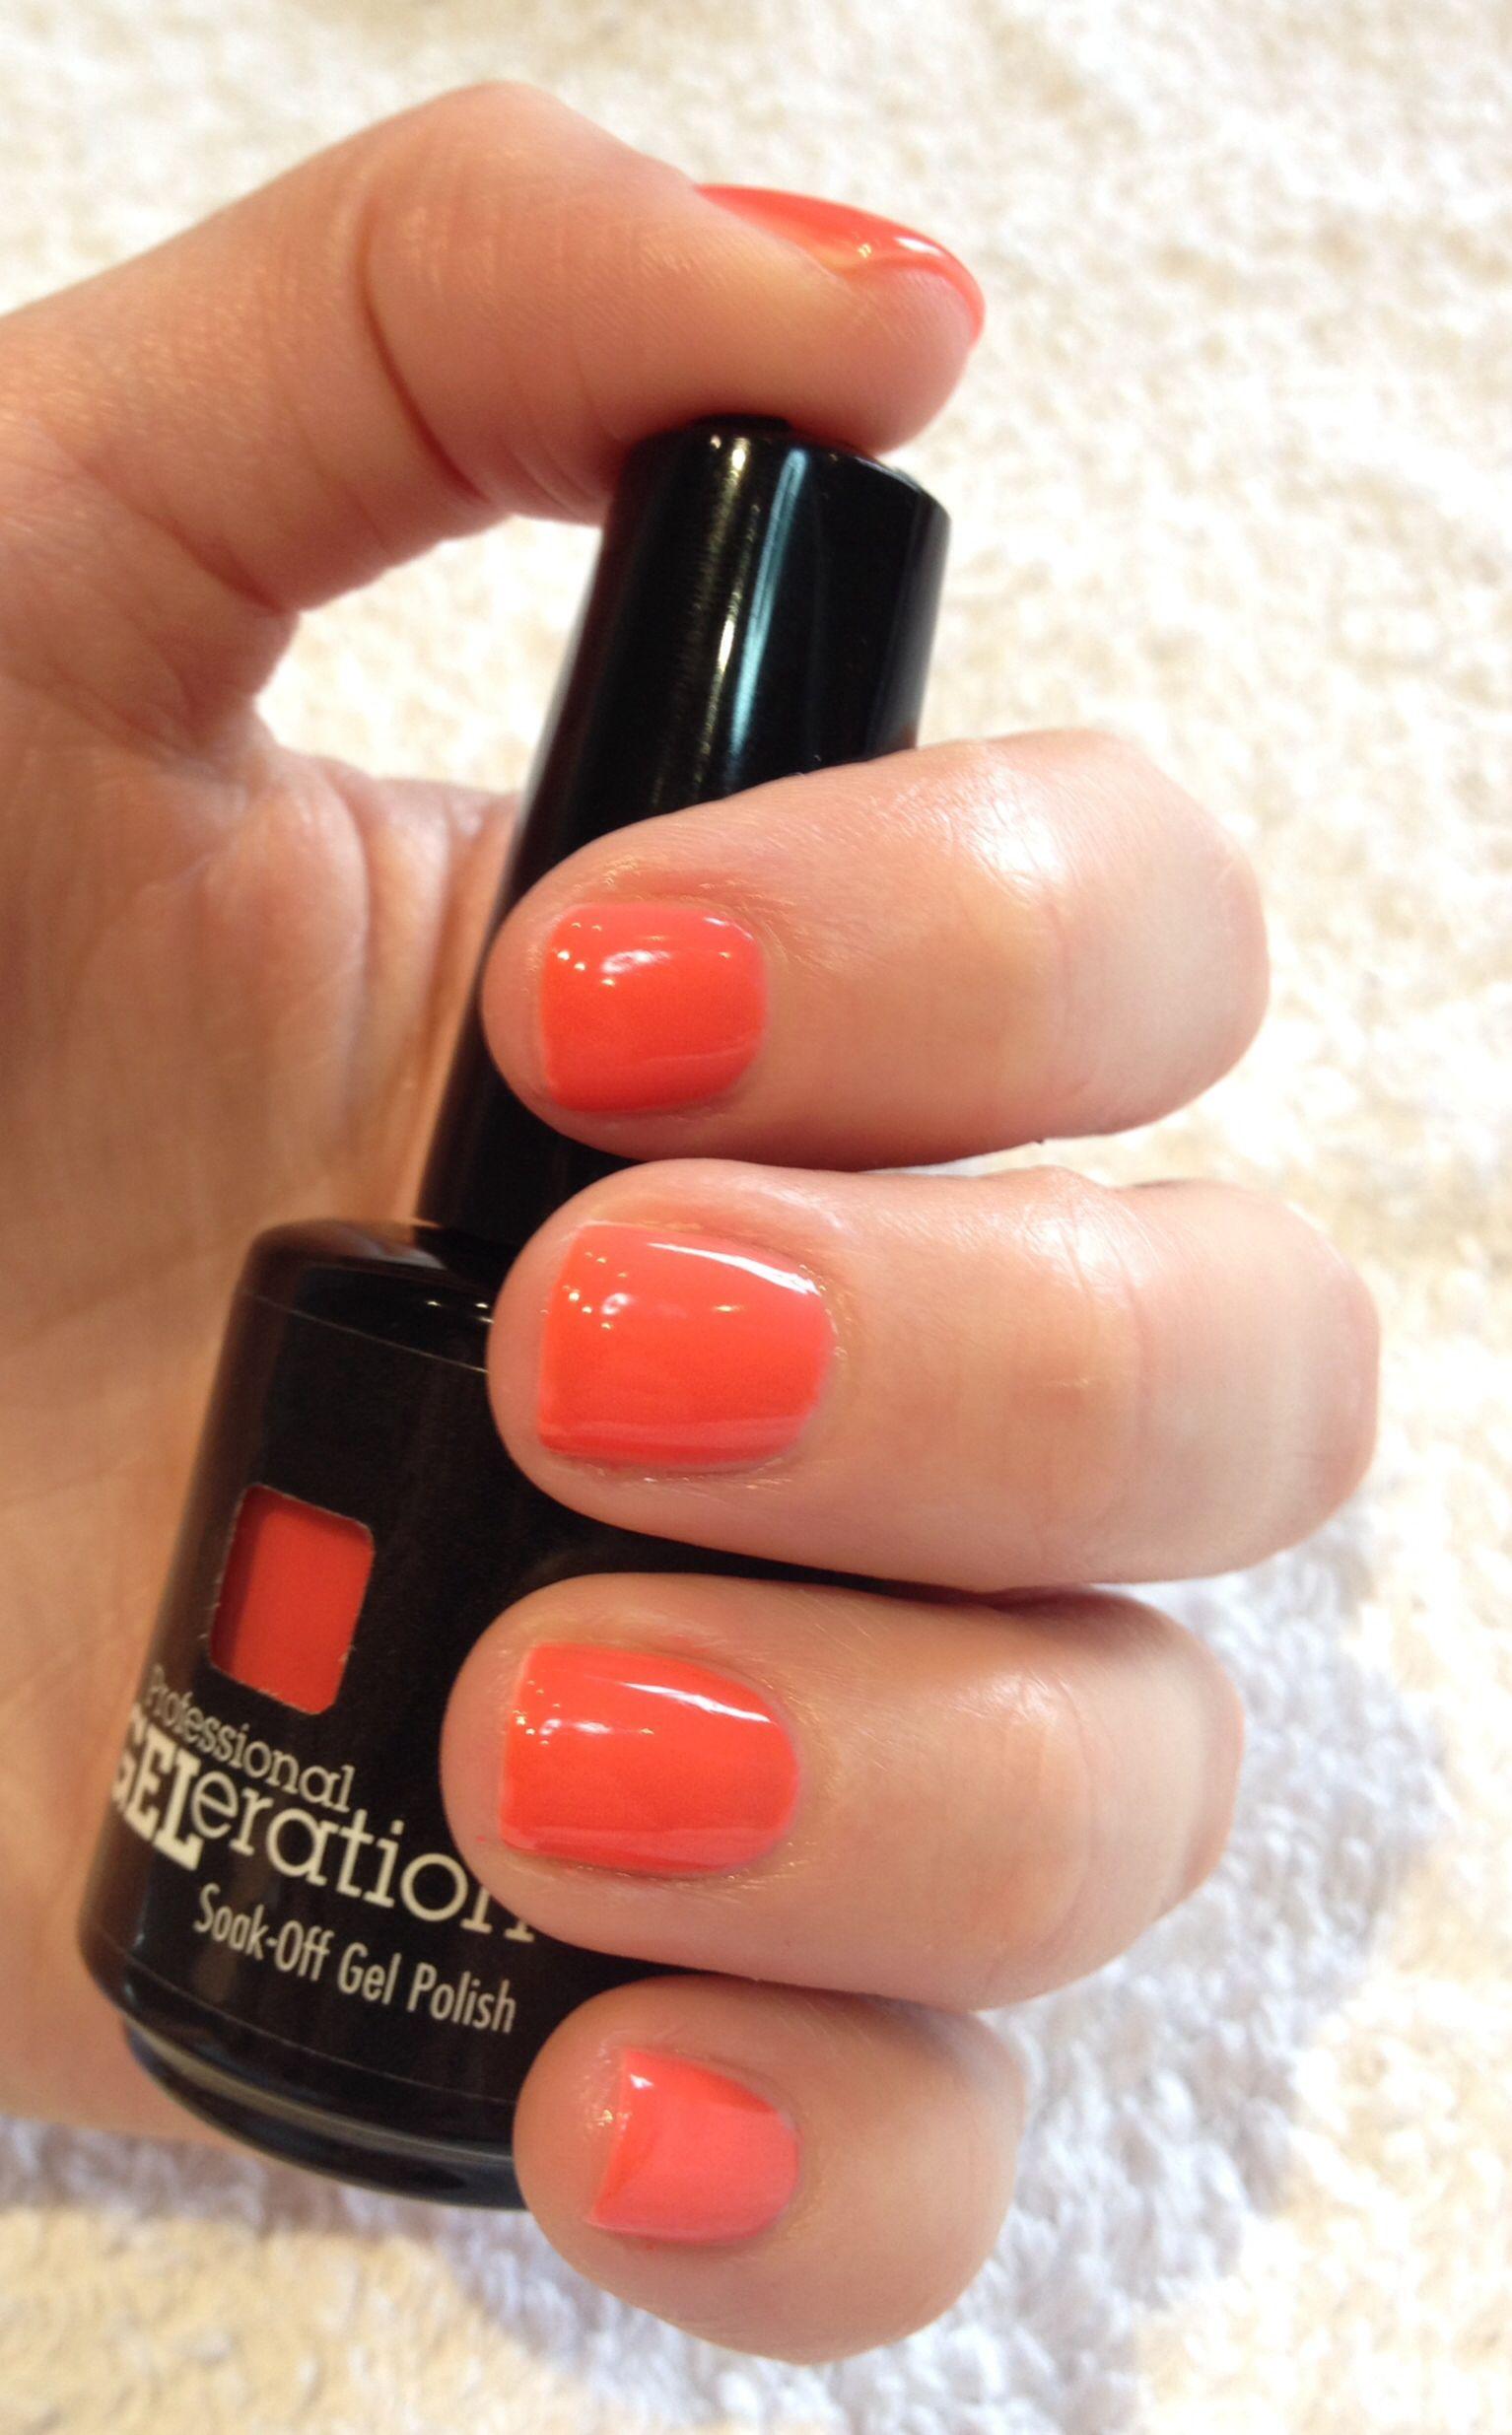 Orange nails for summer. This Jessica GELeration gel ...